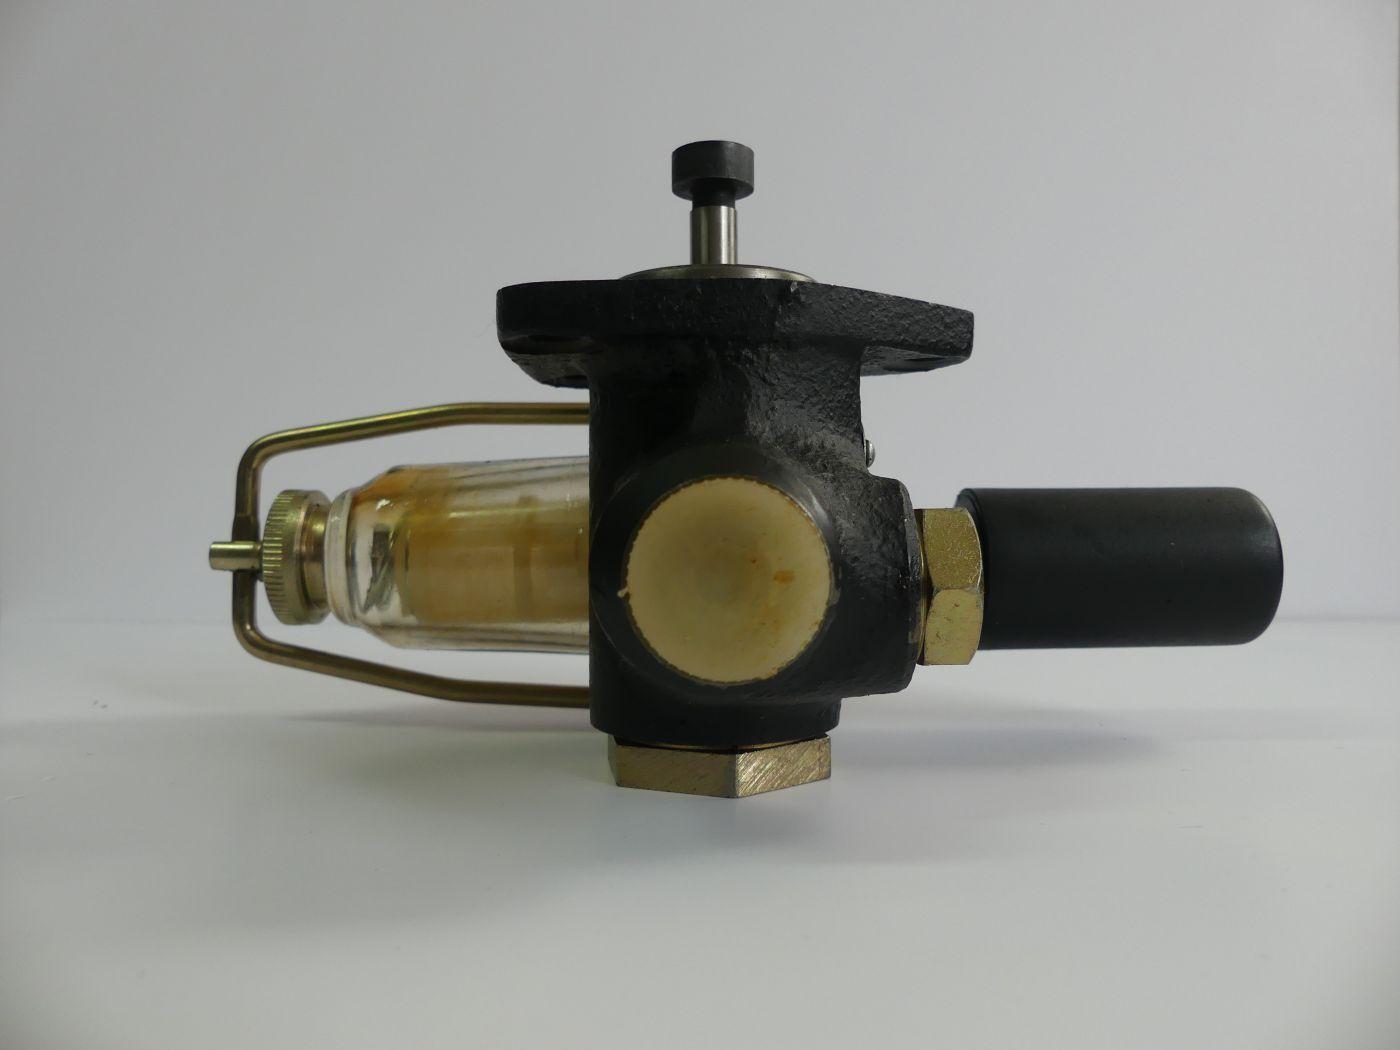 Bomba pré-filtro p/ bomba injetora